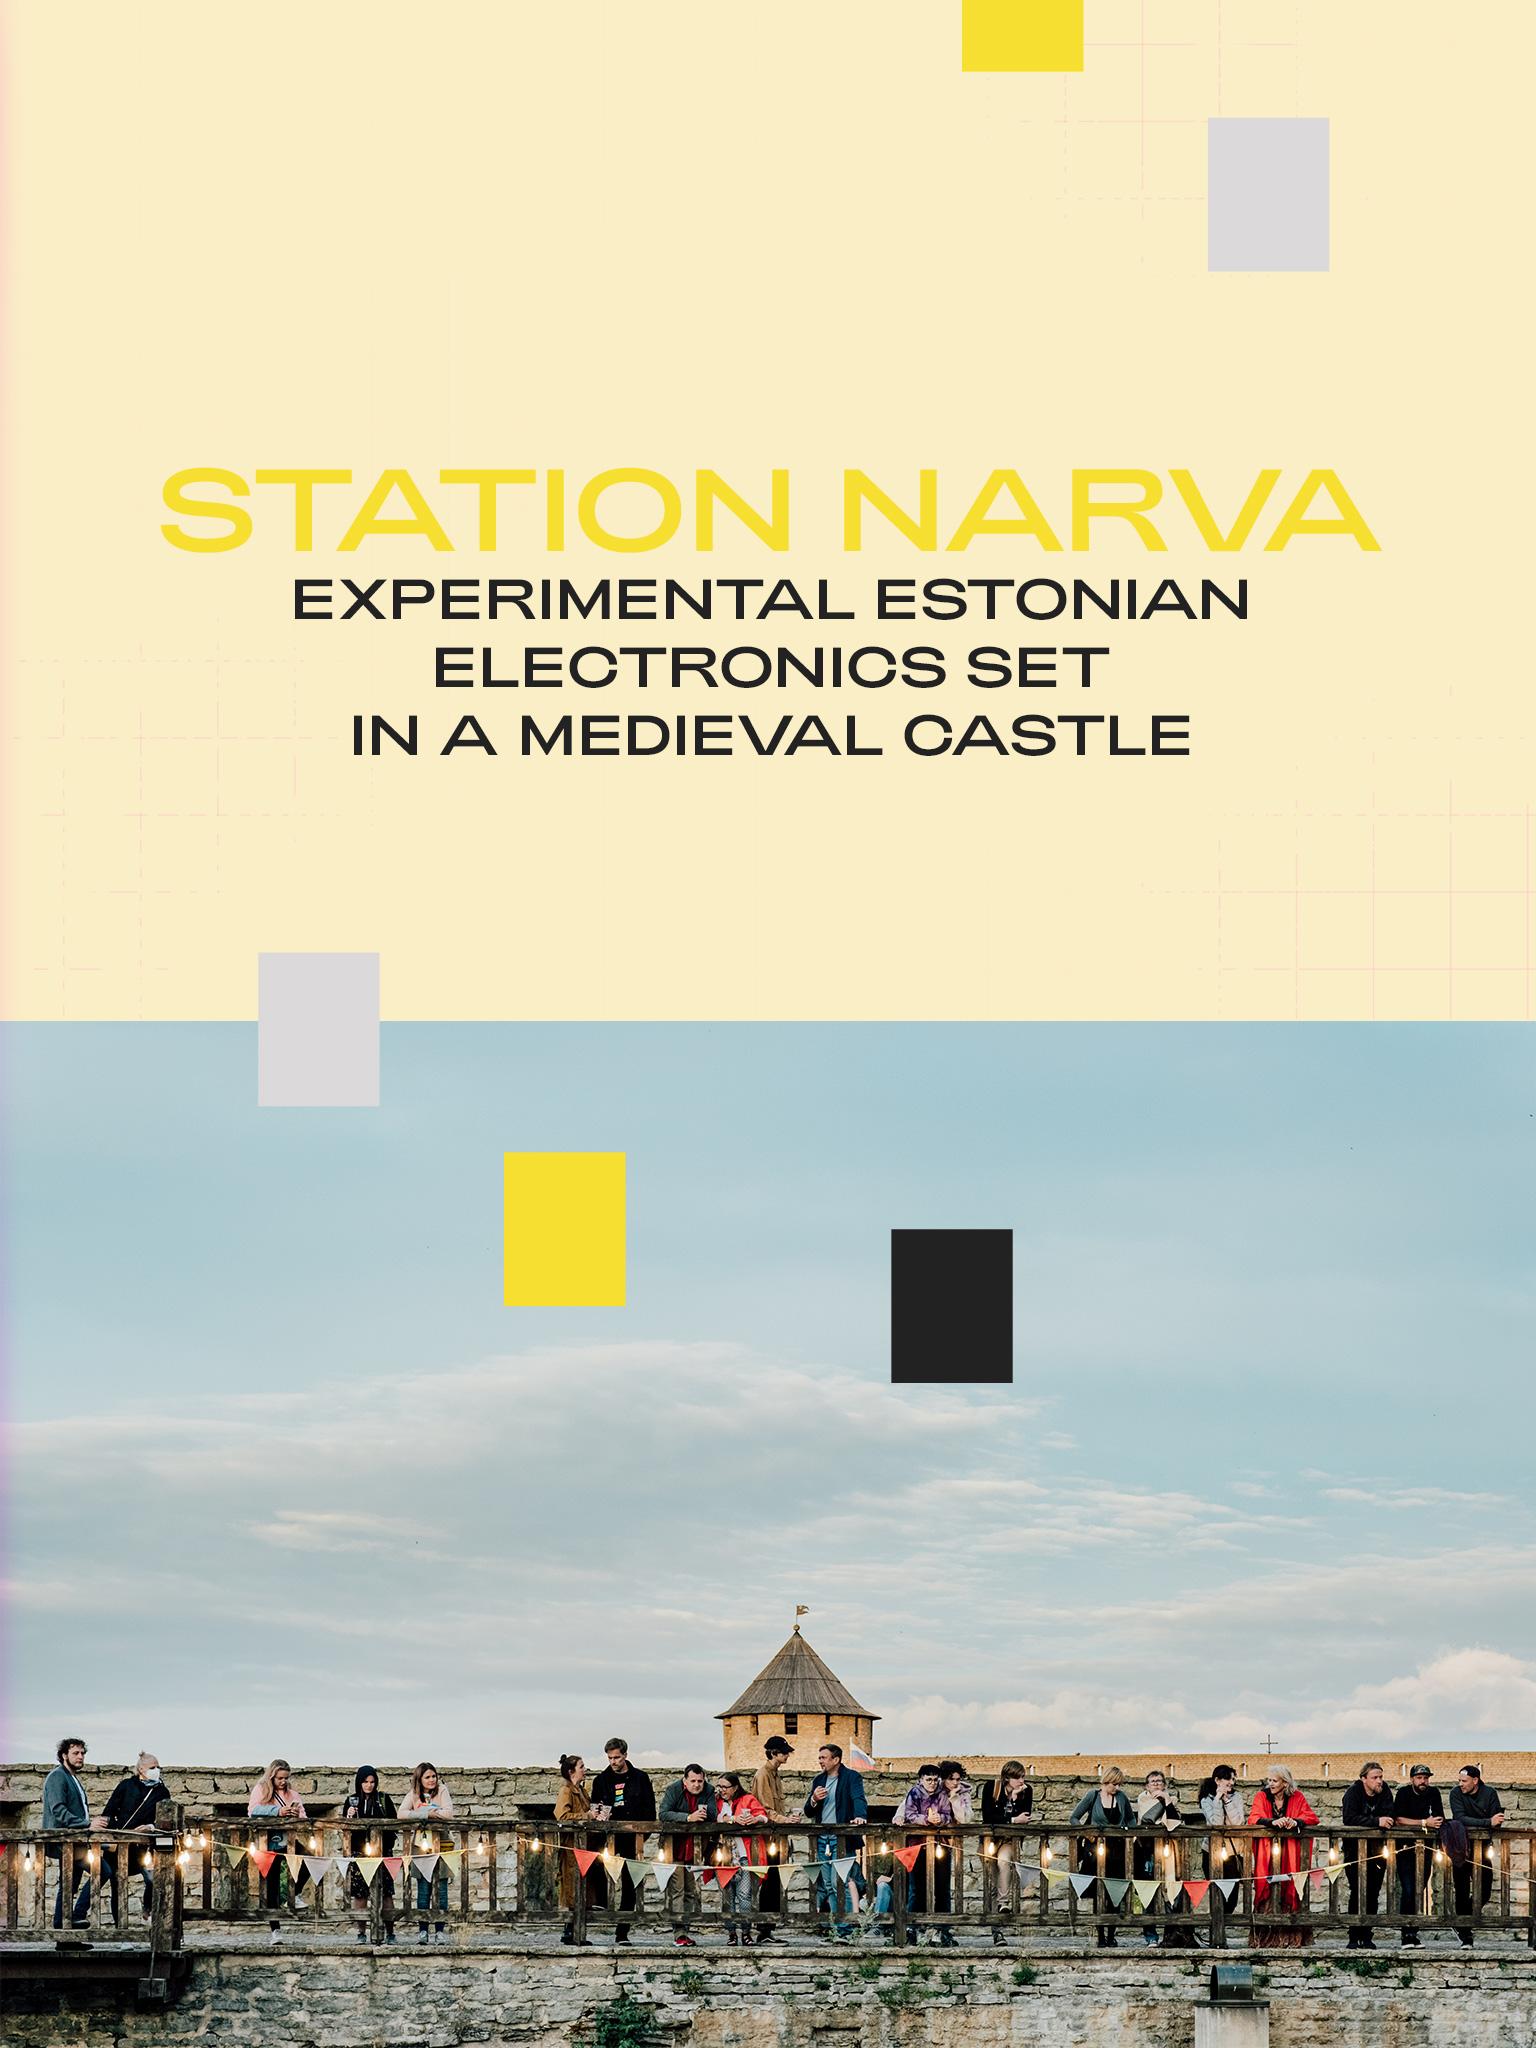 Station Narva: Experimental Estonian Electronics Set in a Medieval Castle